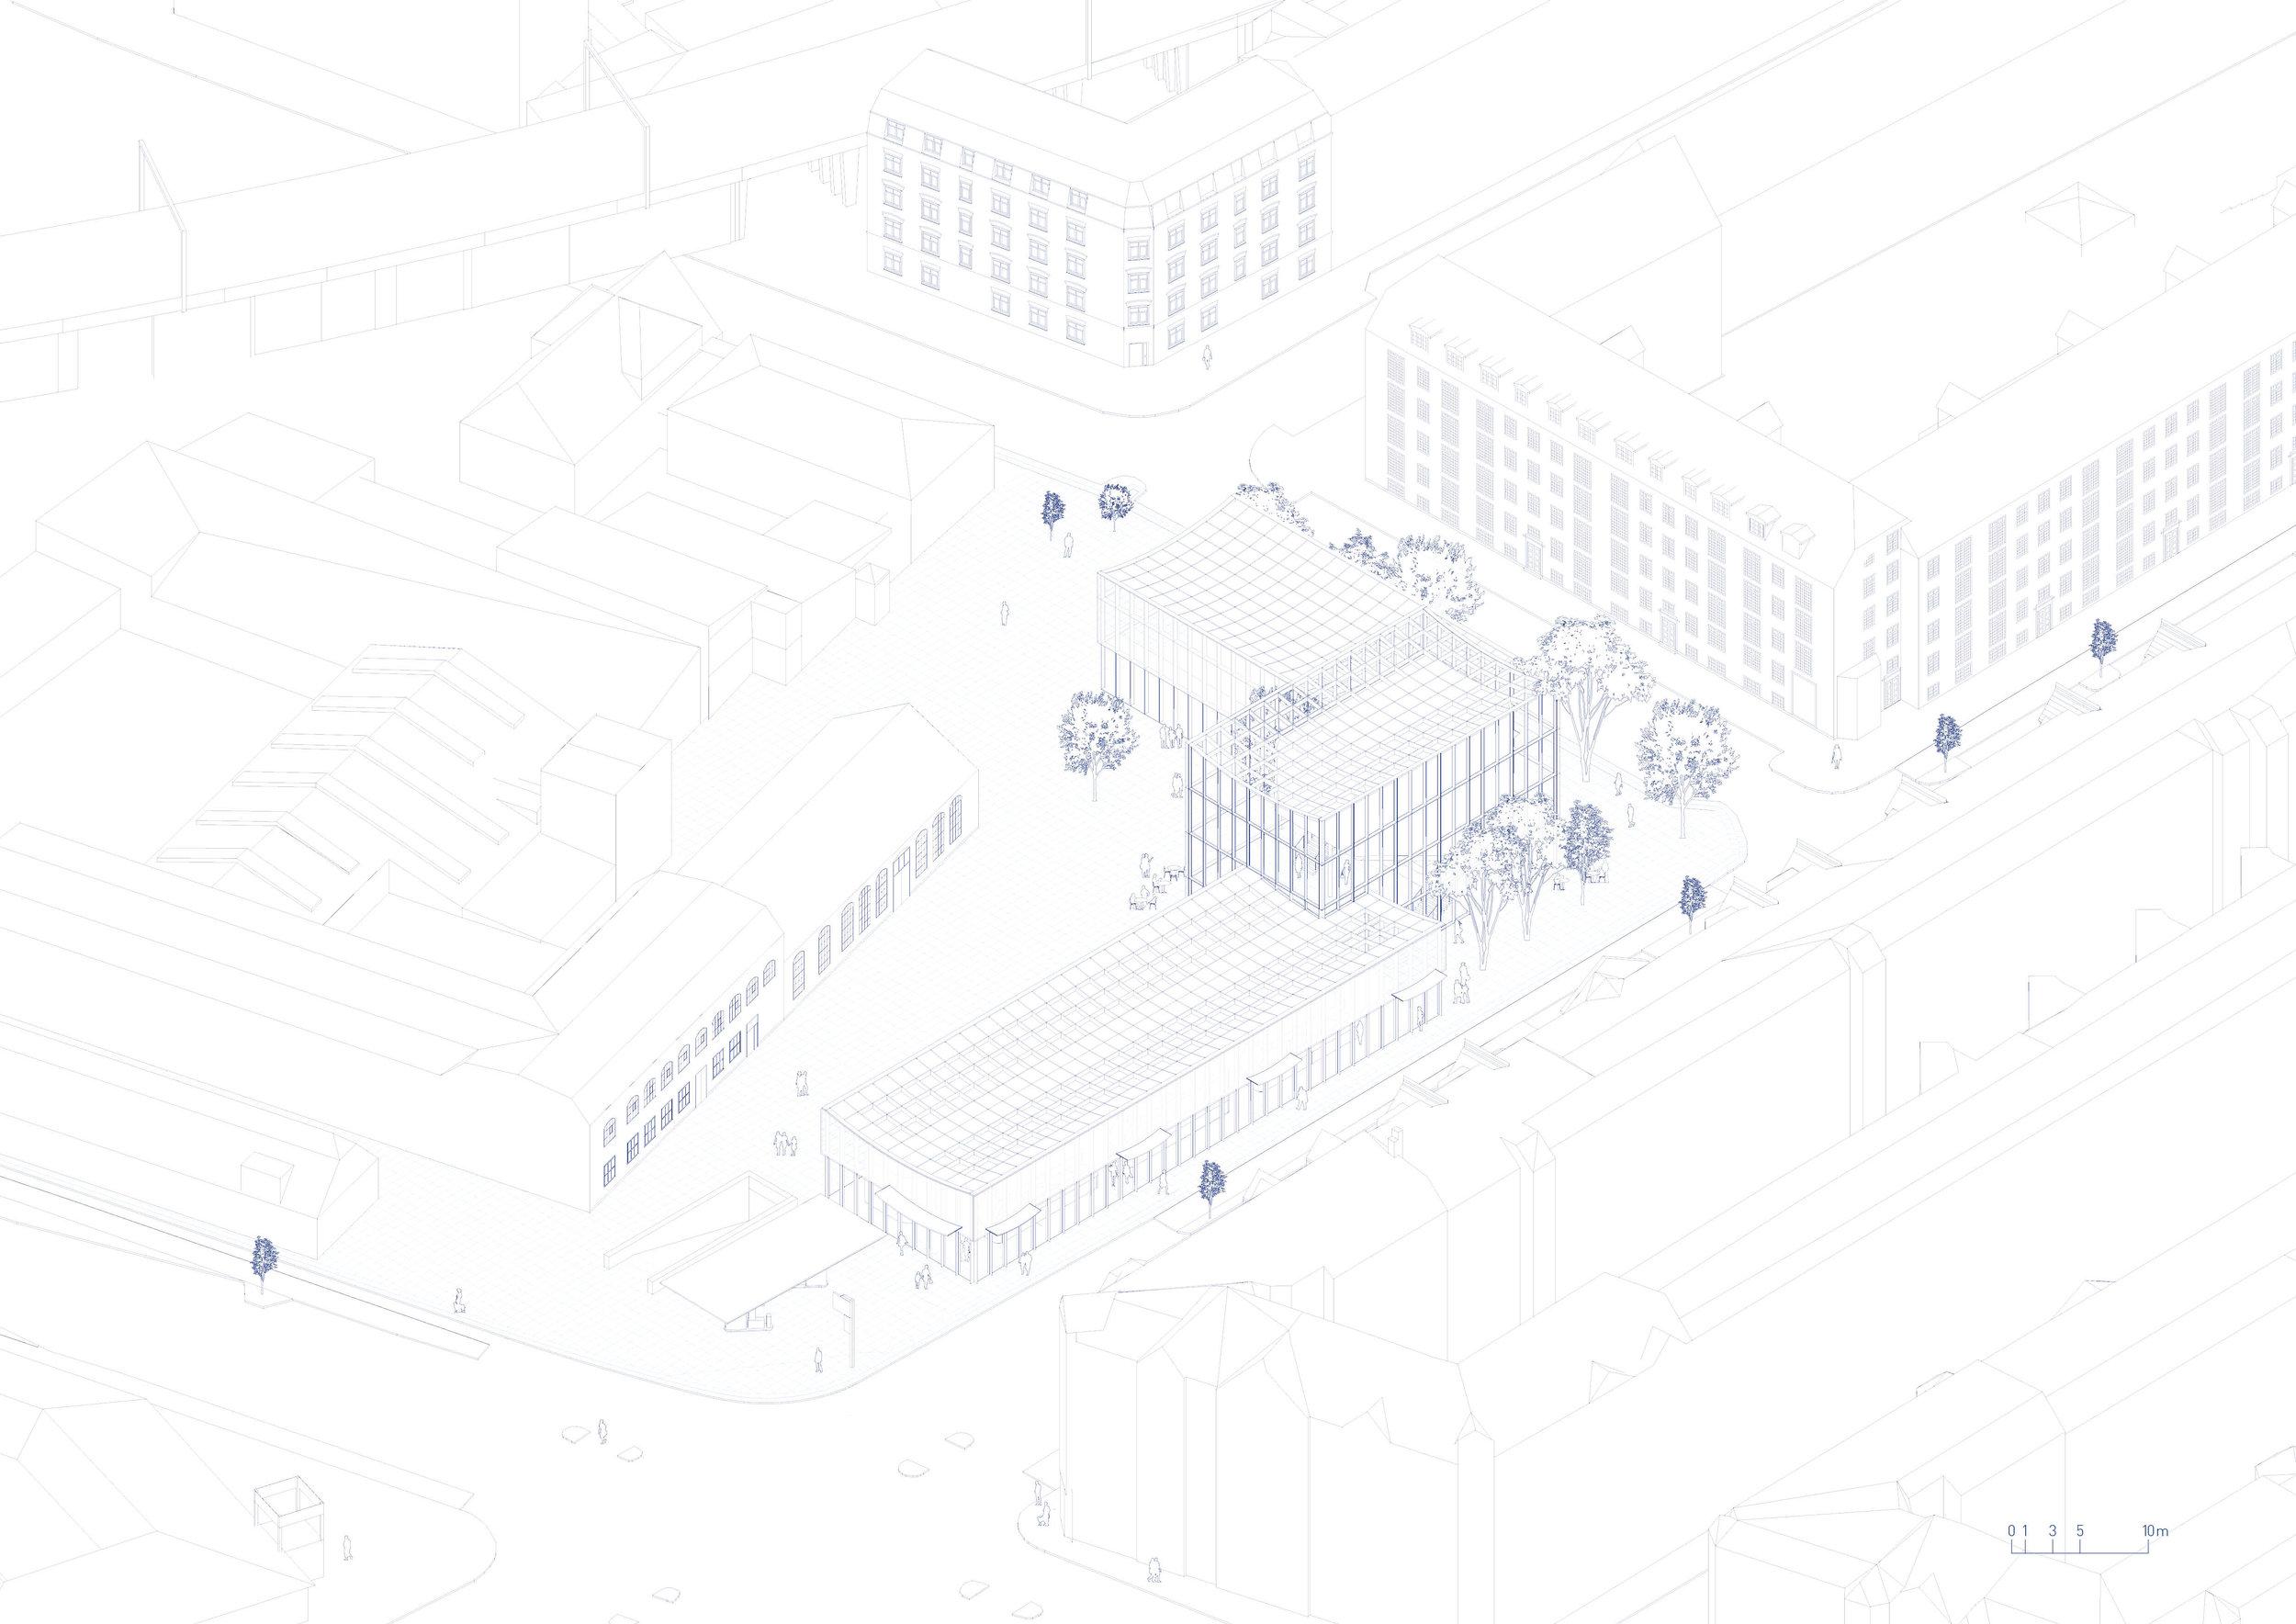 Tikøbshallerne web 2.jpg